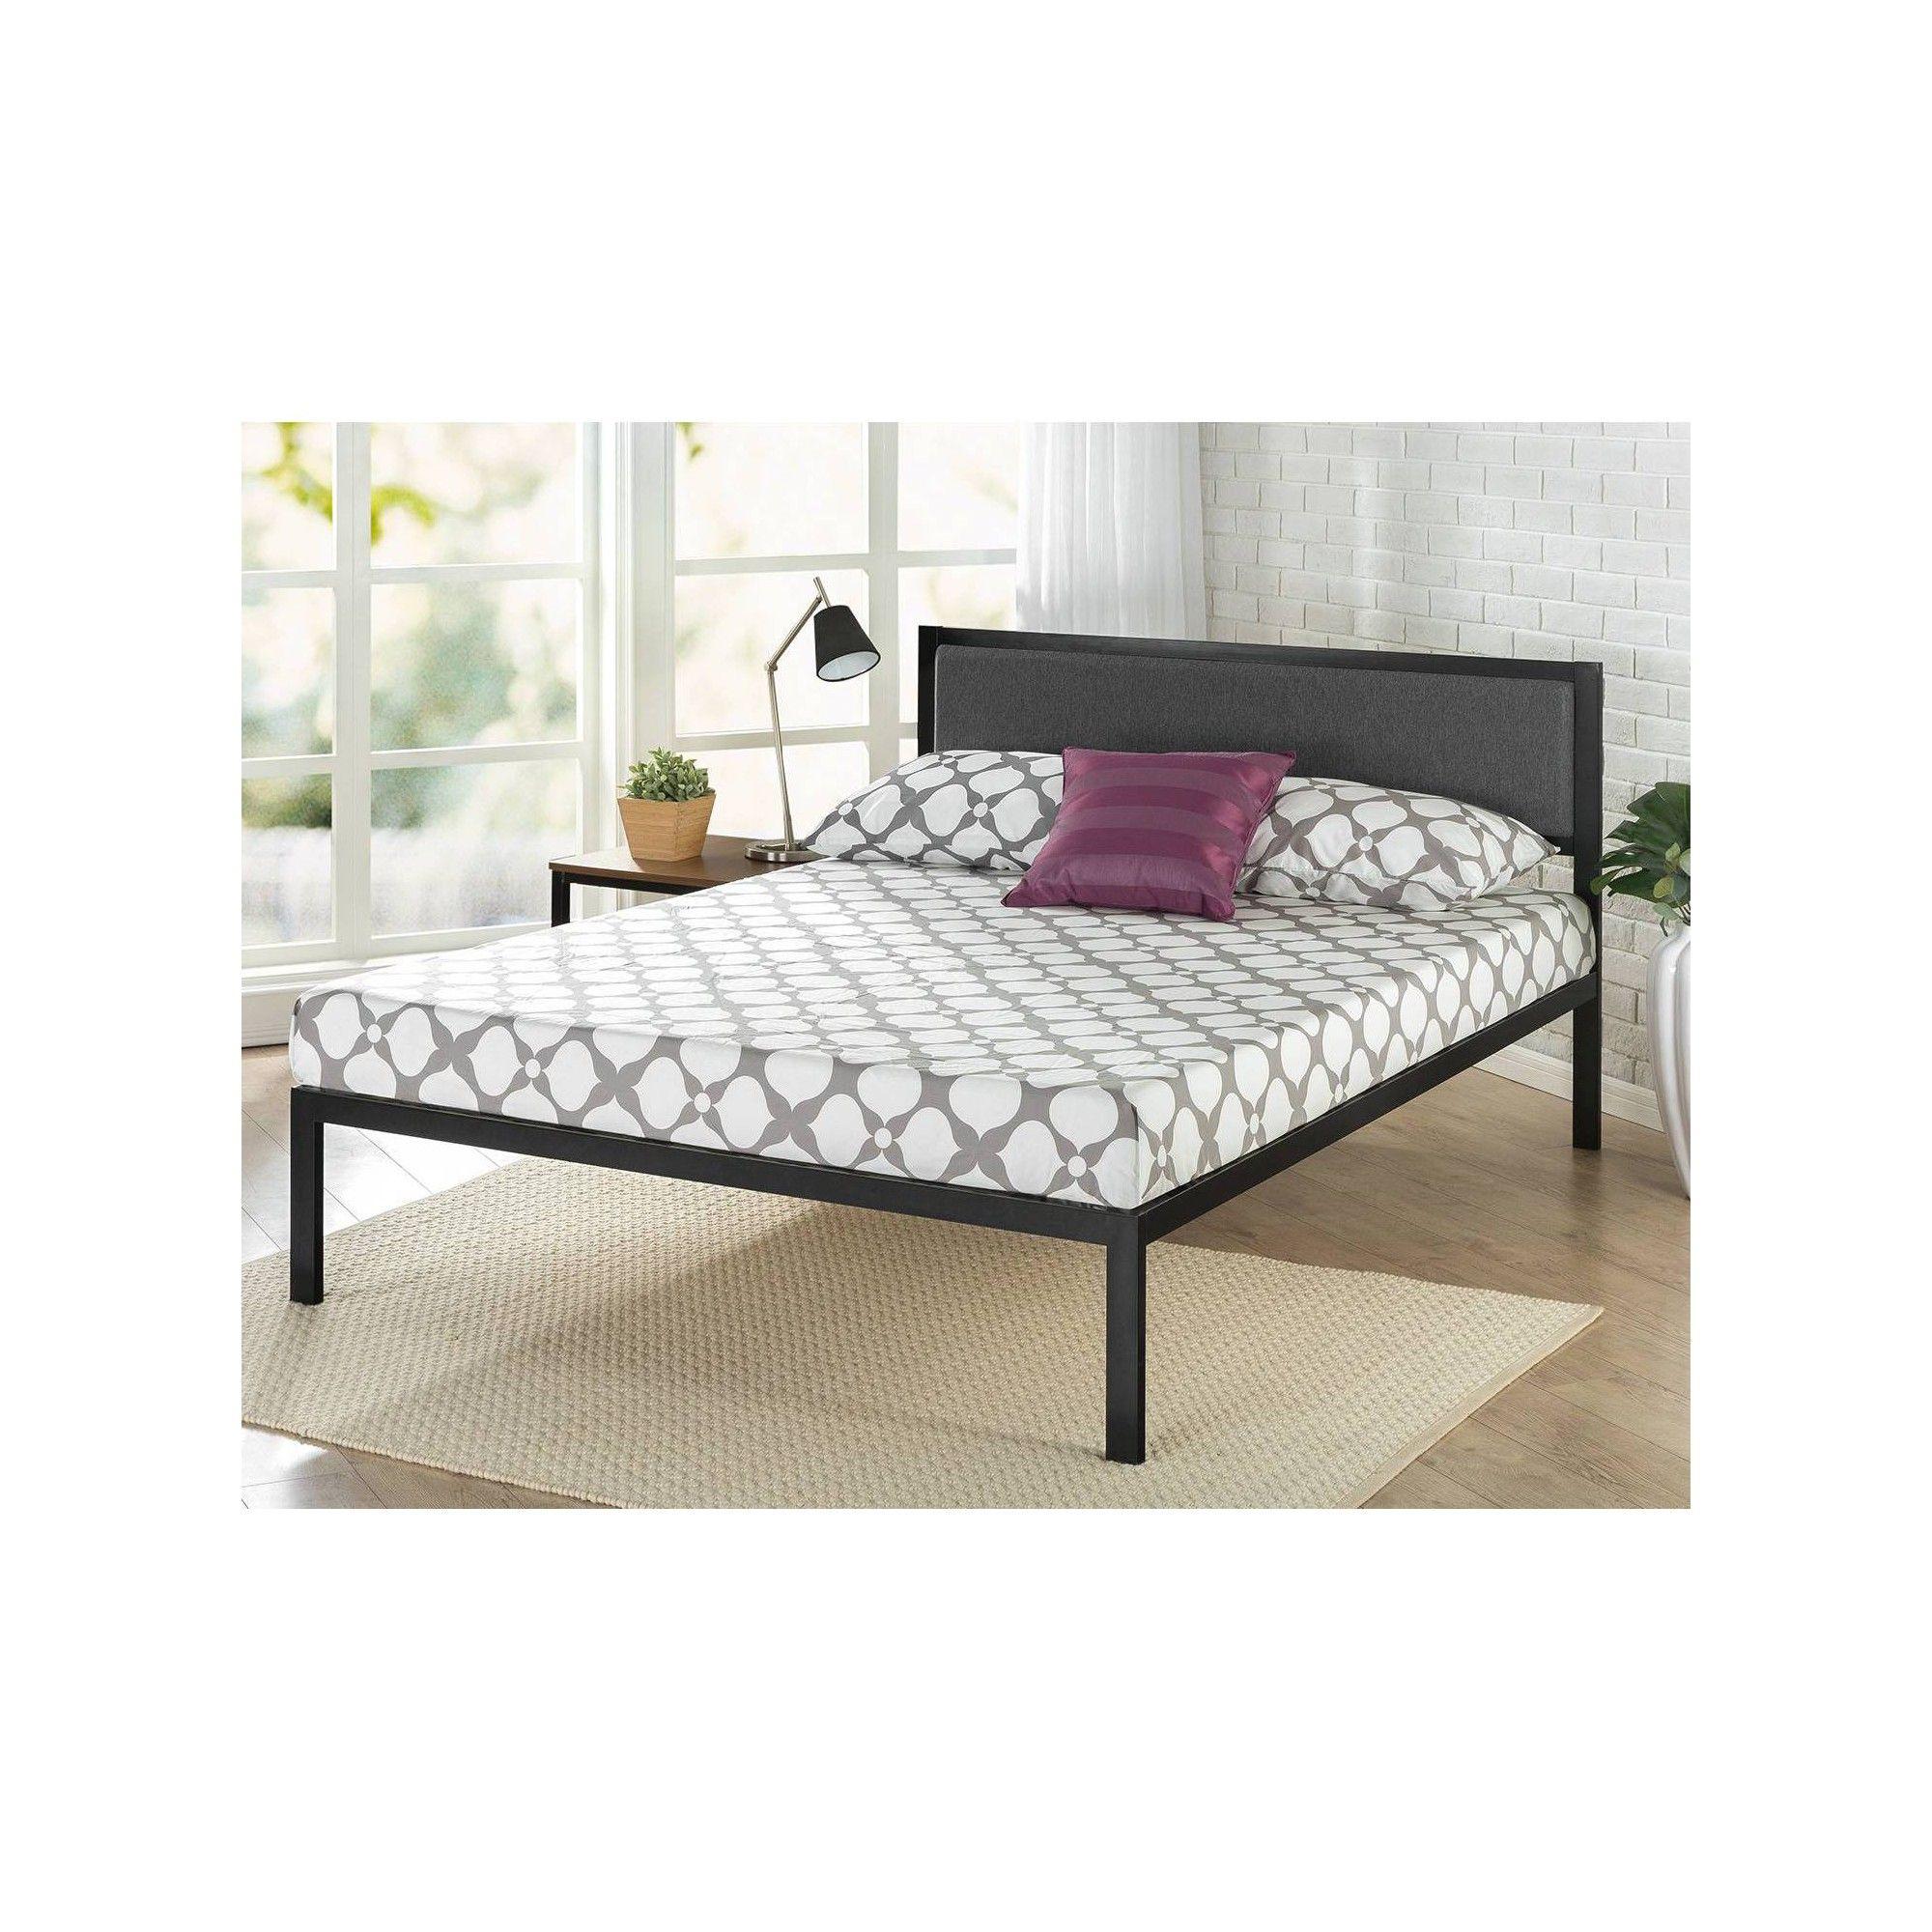 Queen Korey Platform Metal Bed Frame With Upholstered Headboard